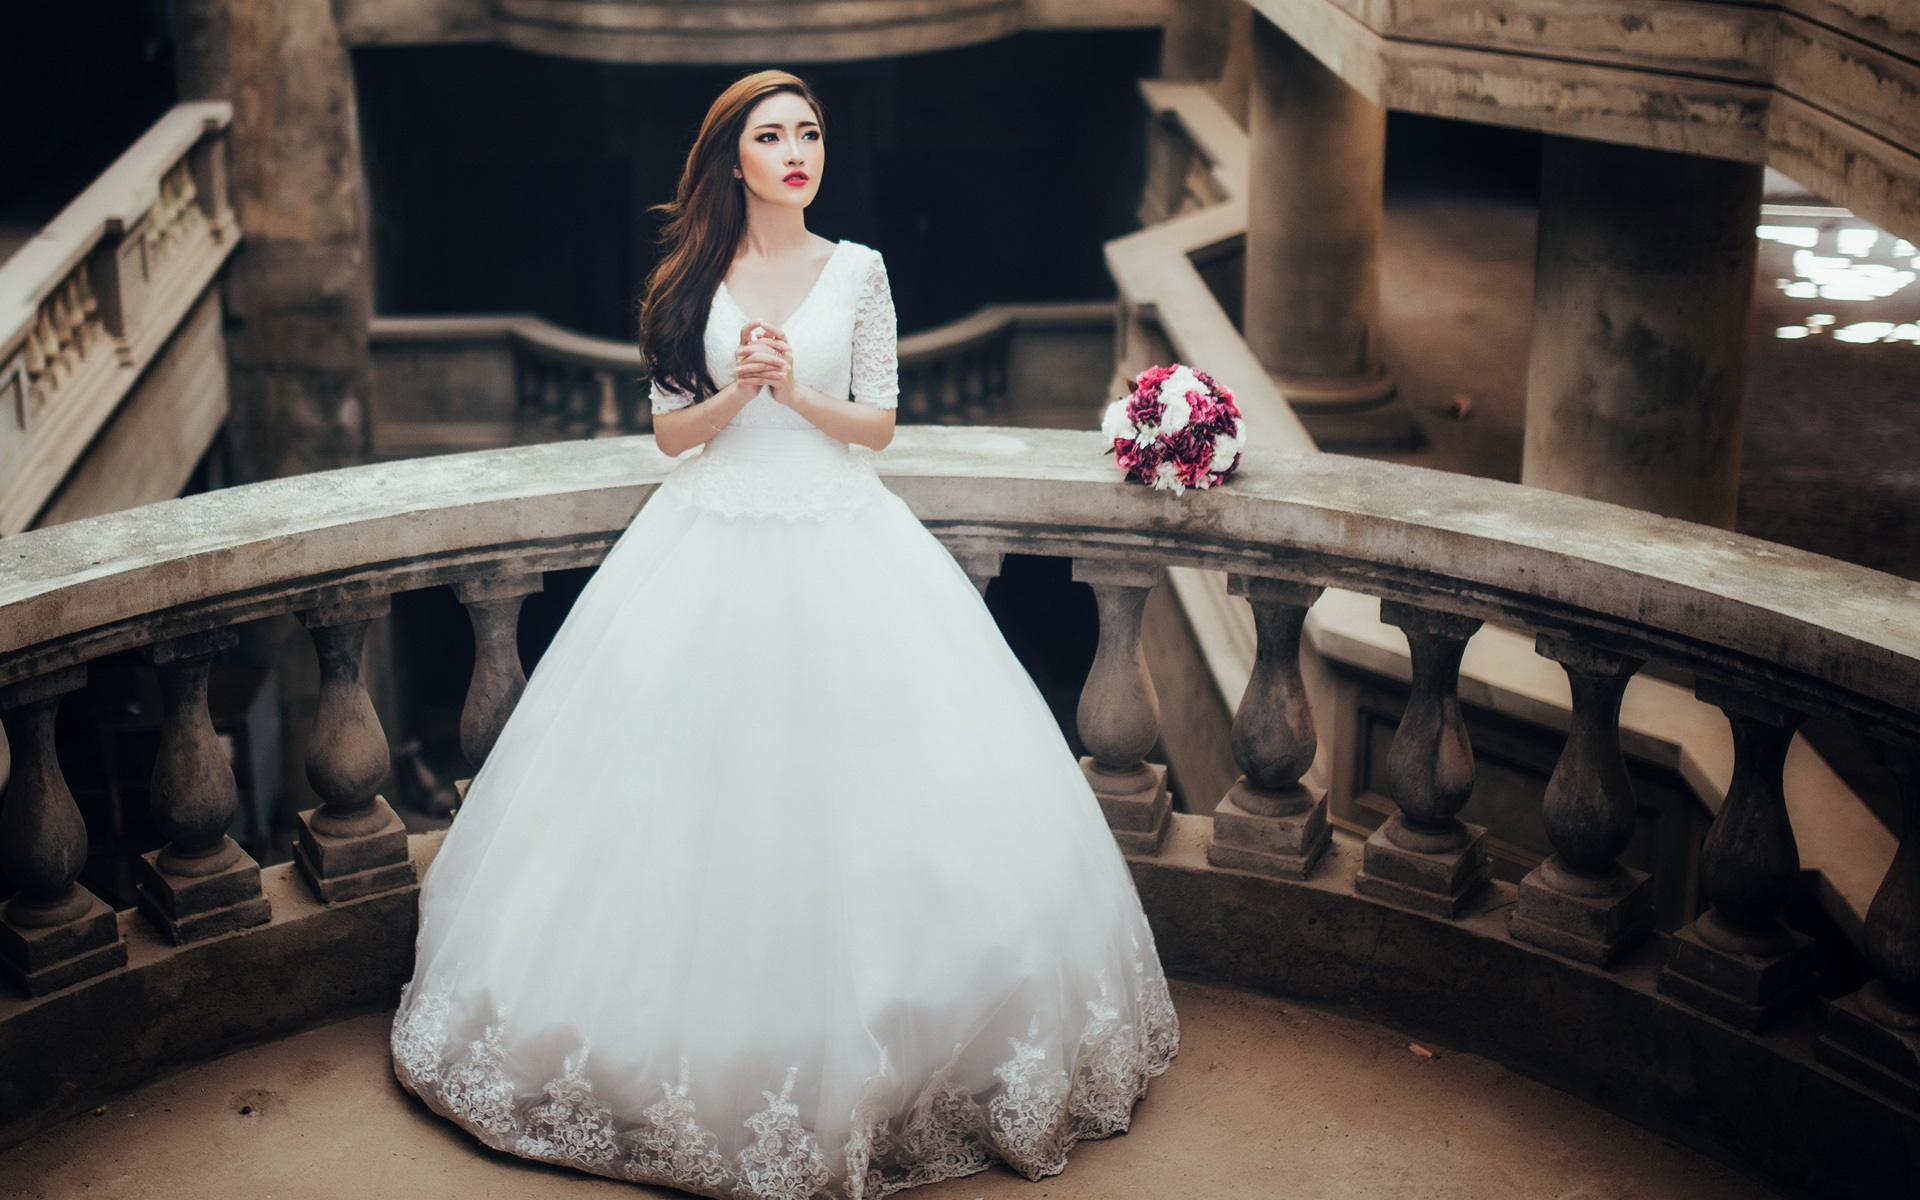 0190f154fce4 Bride HD Wallpaper | Background Image | 1920x1200 | ID:833969 - Wallpaper  Abyss